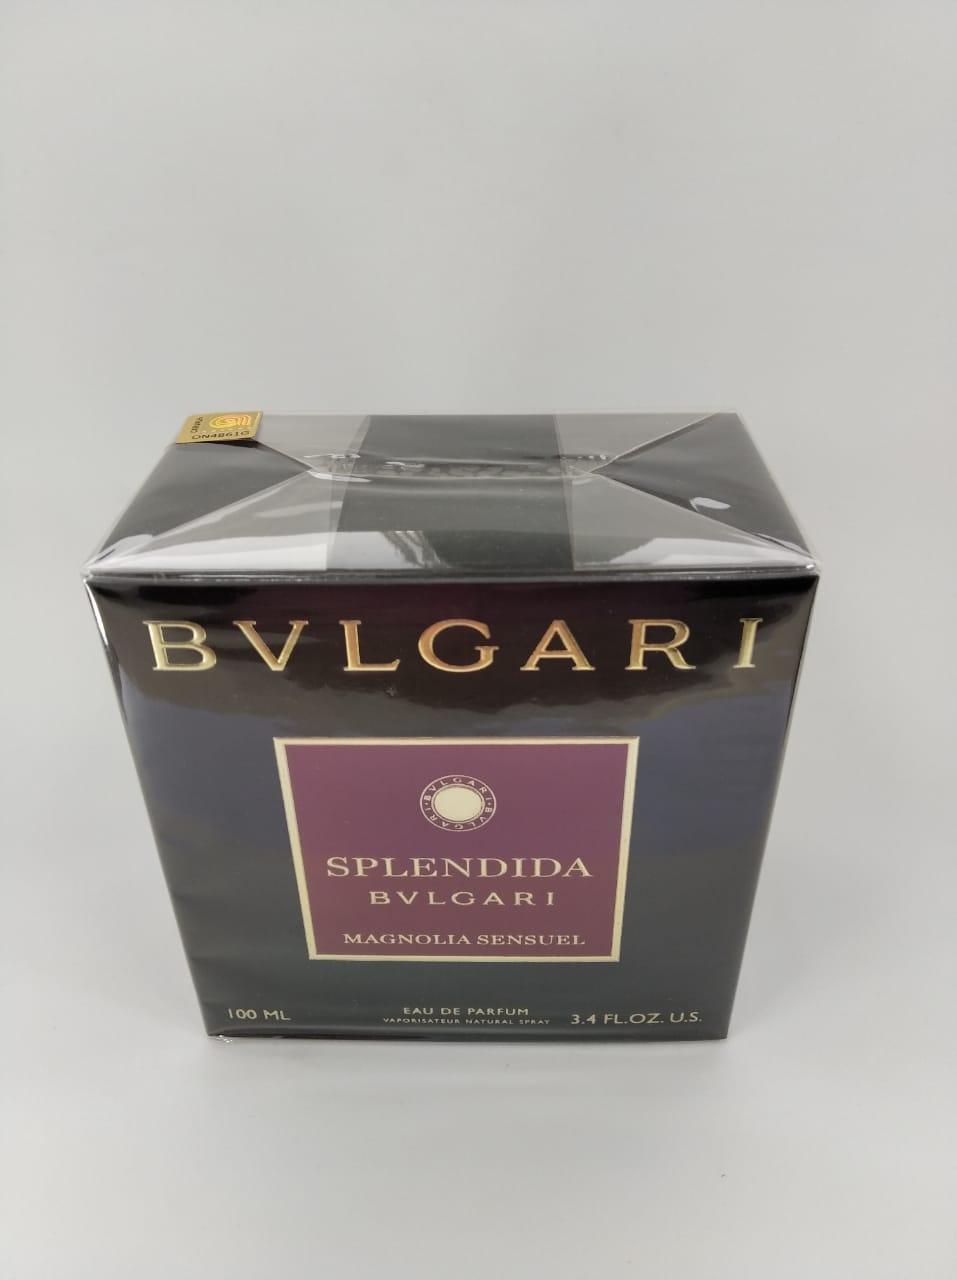 Splendida Magnolia Sensuel Bvlgari Eau de Parfum 100ml